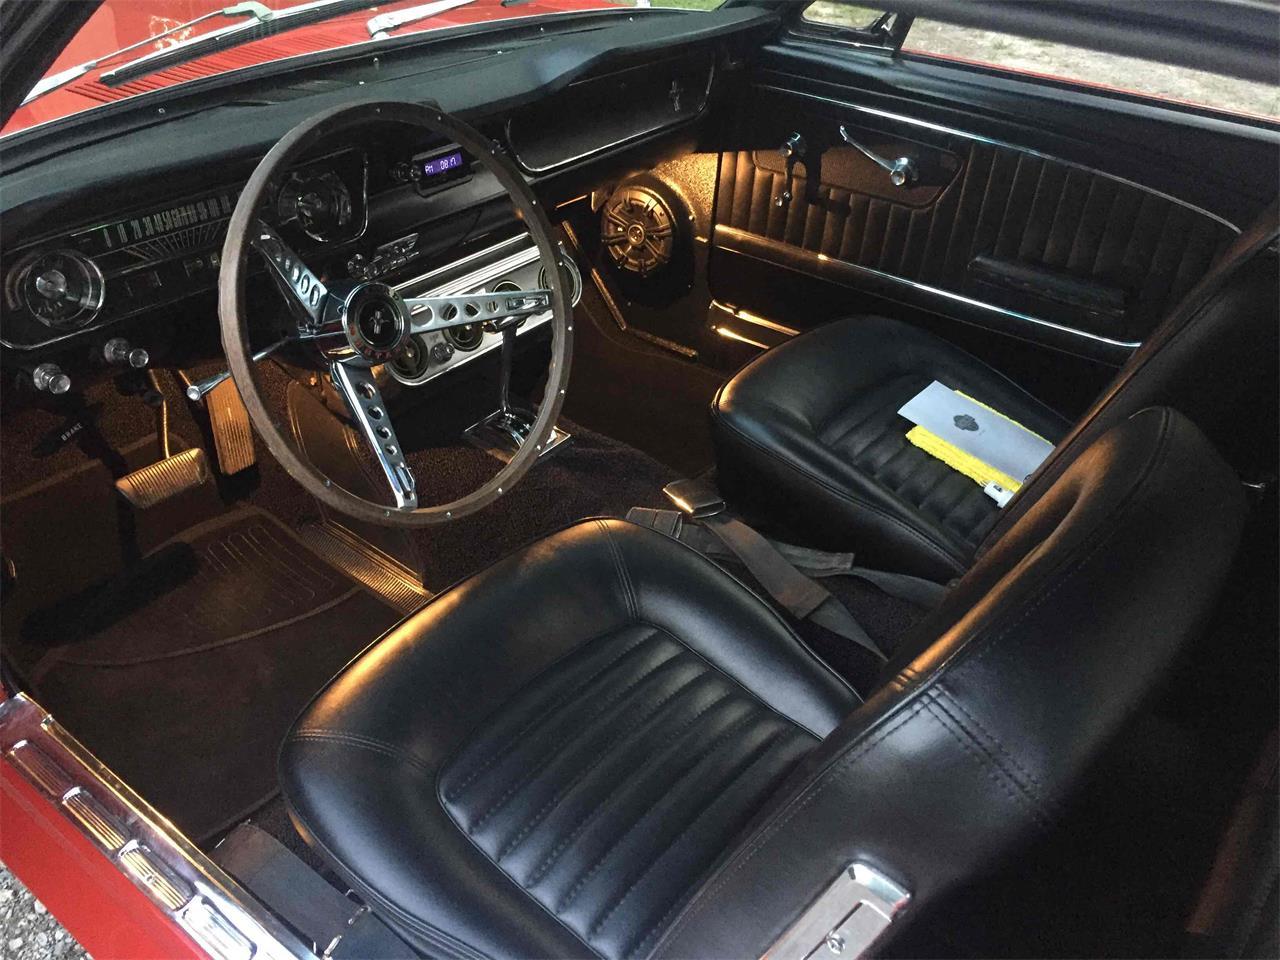 1965 Ford Mustang (CC-1269510) for sale in Moncks Corner, South Carolina